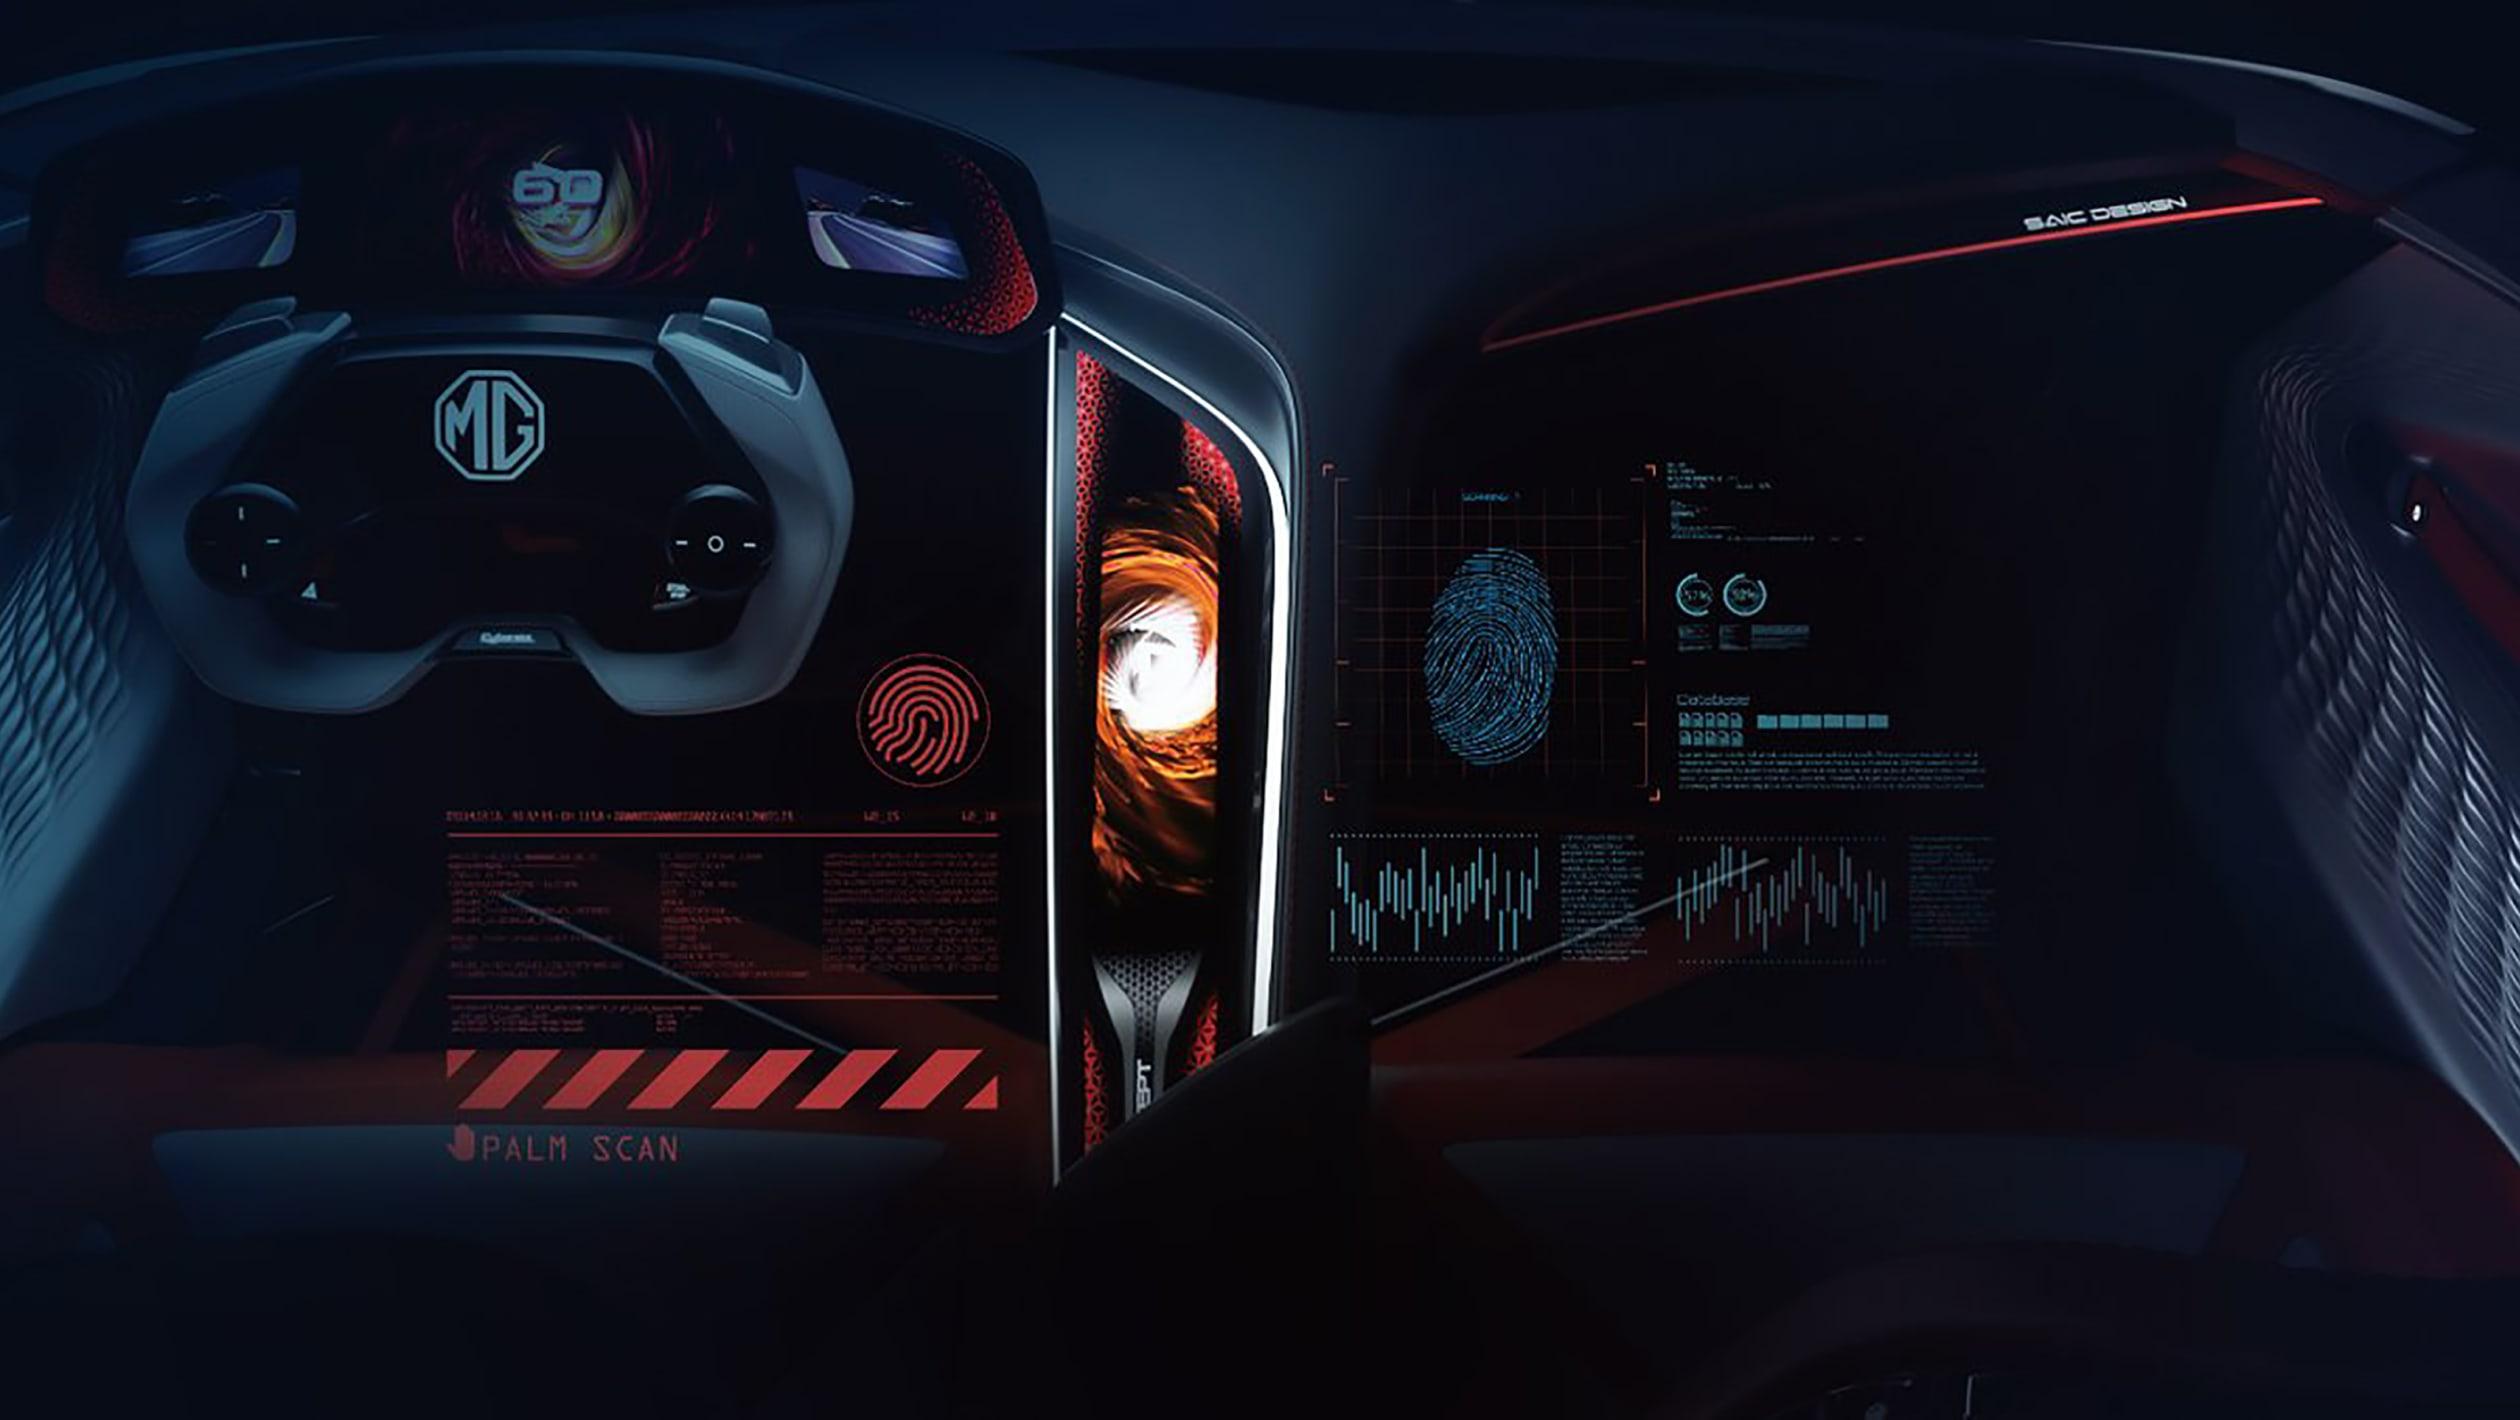 mg-cyberster-interior-1